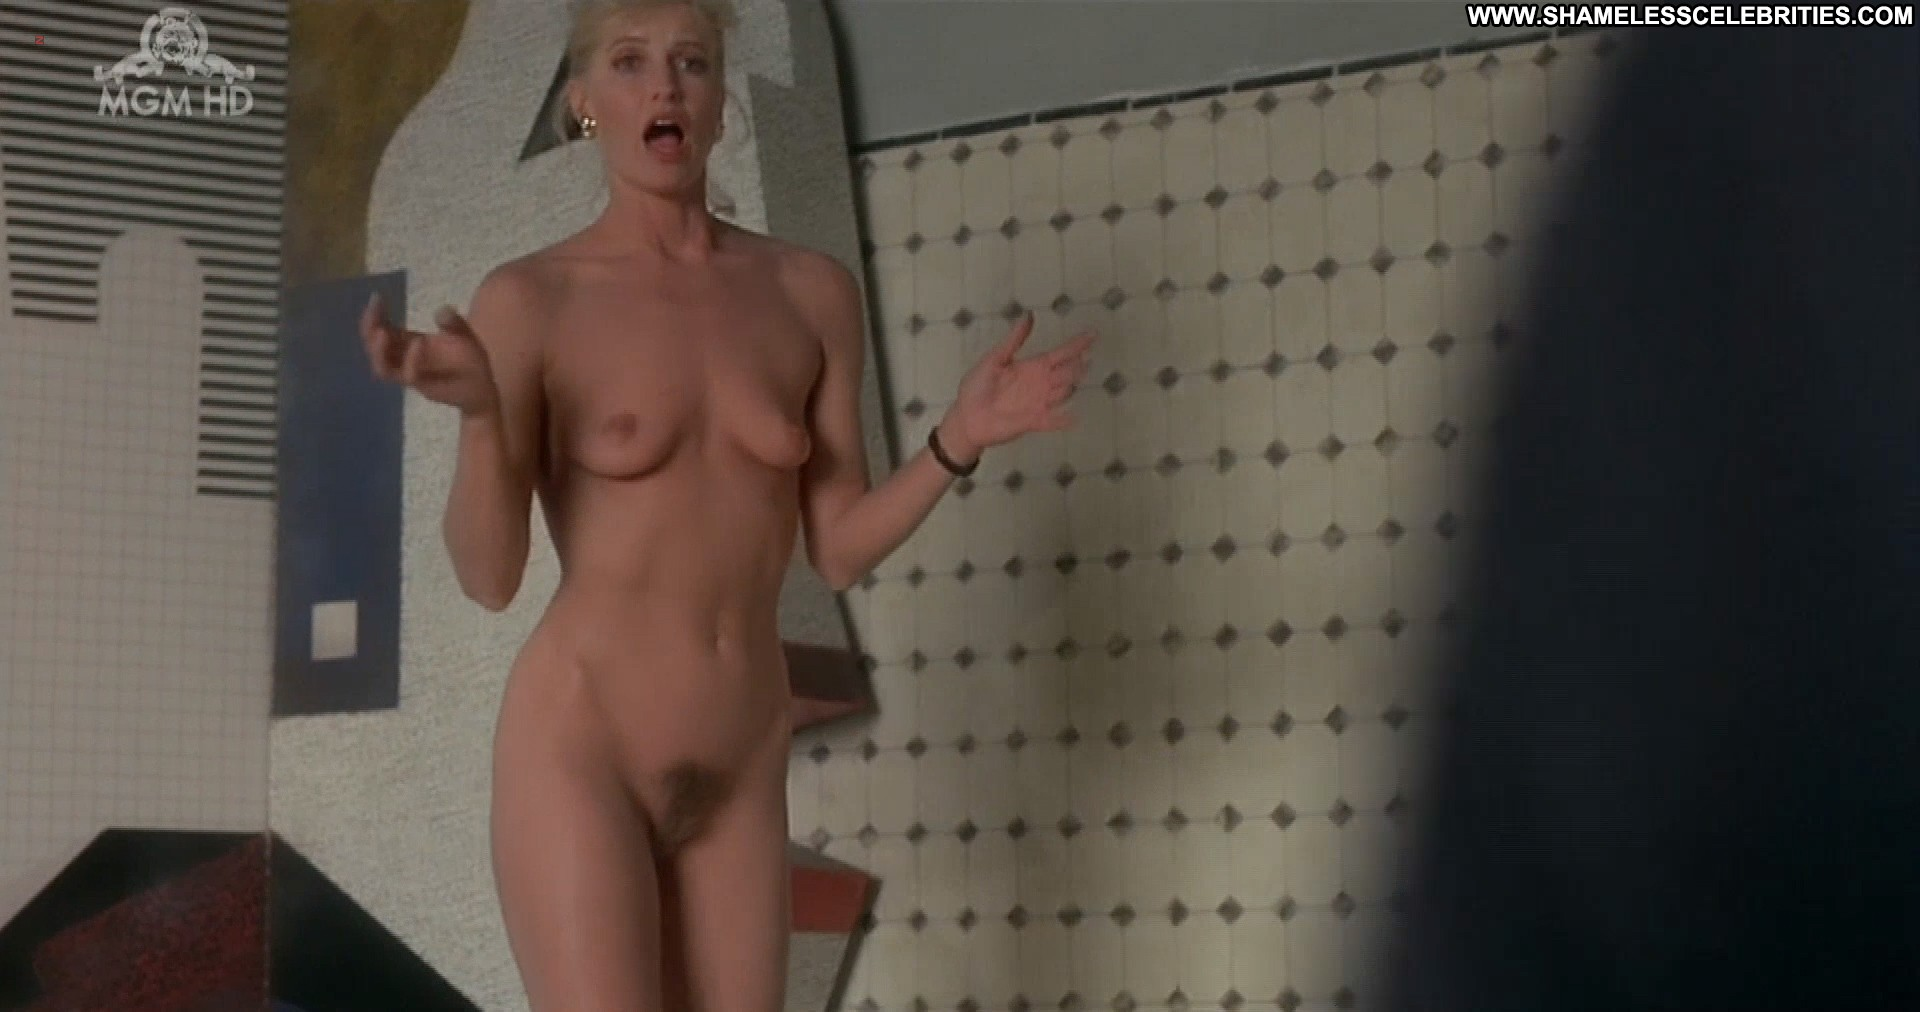 Virginia madsen nude